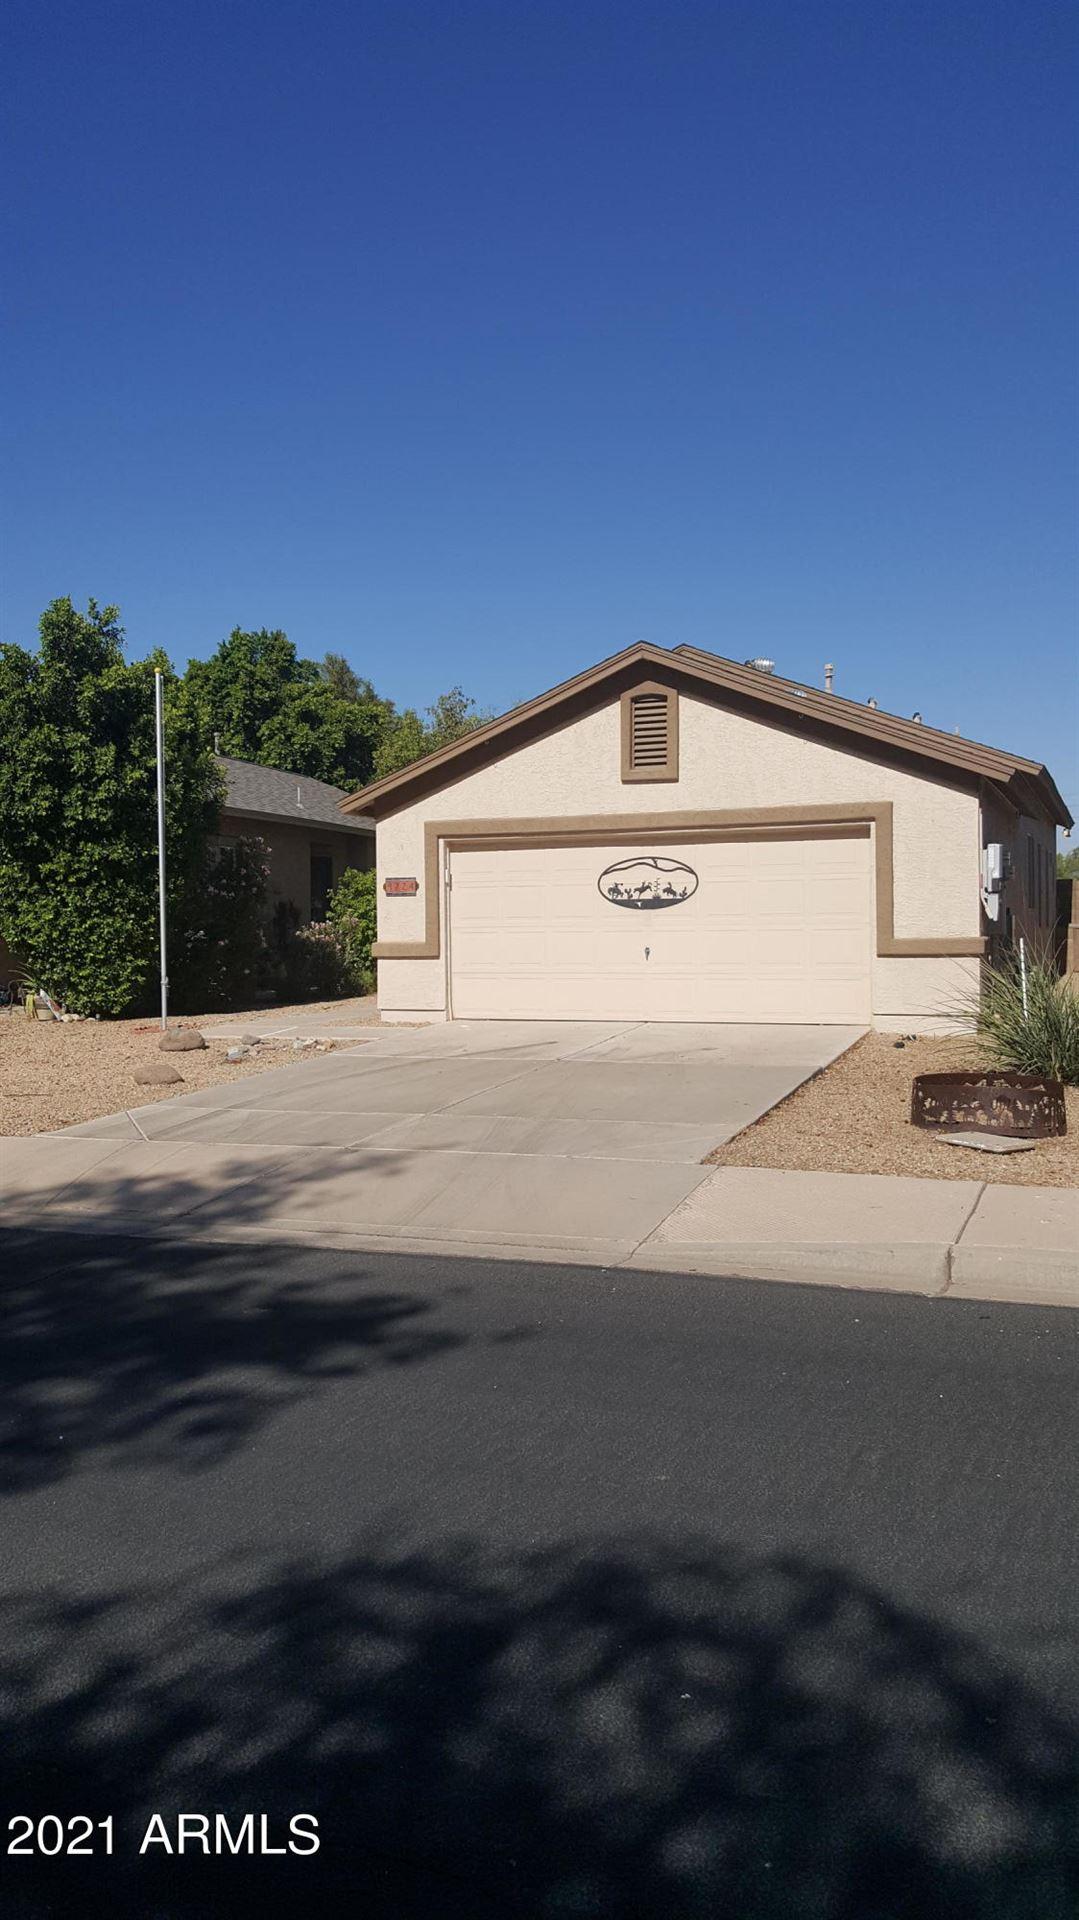 Photo of 9724 N 97TH Lane, Peoria, AZ 85345 (MLS # 6249920)